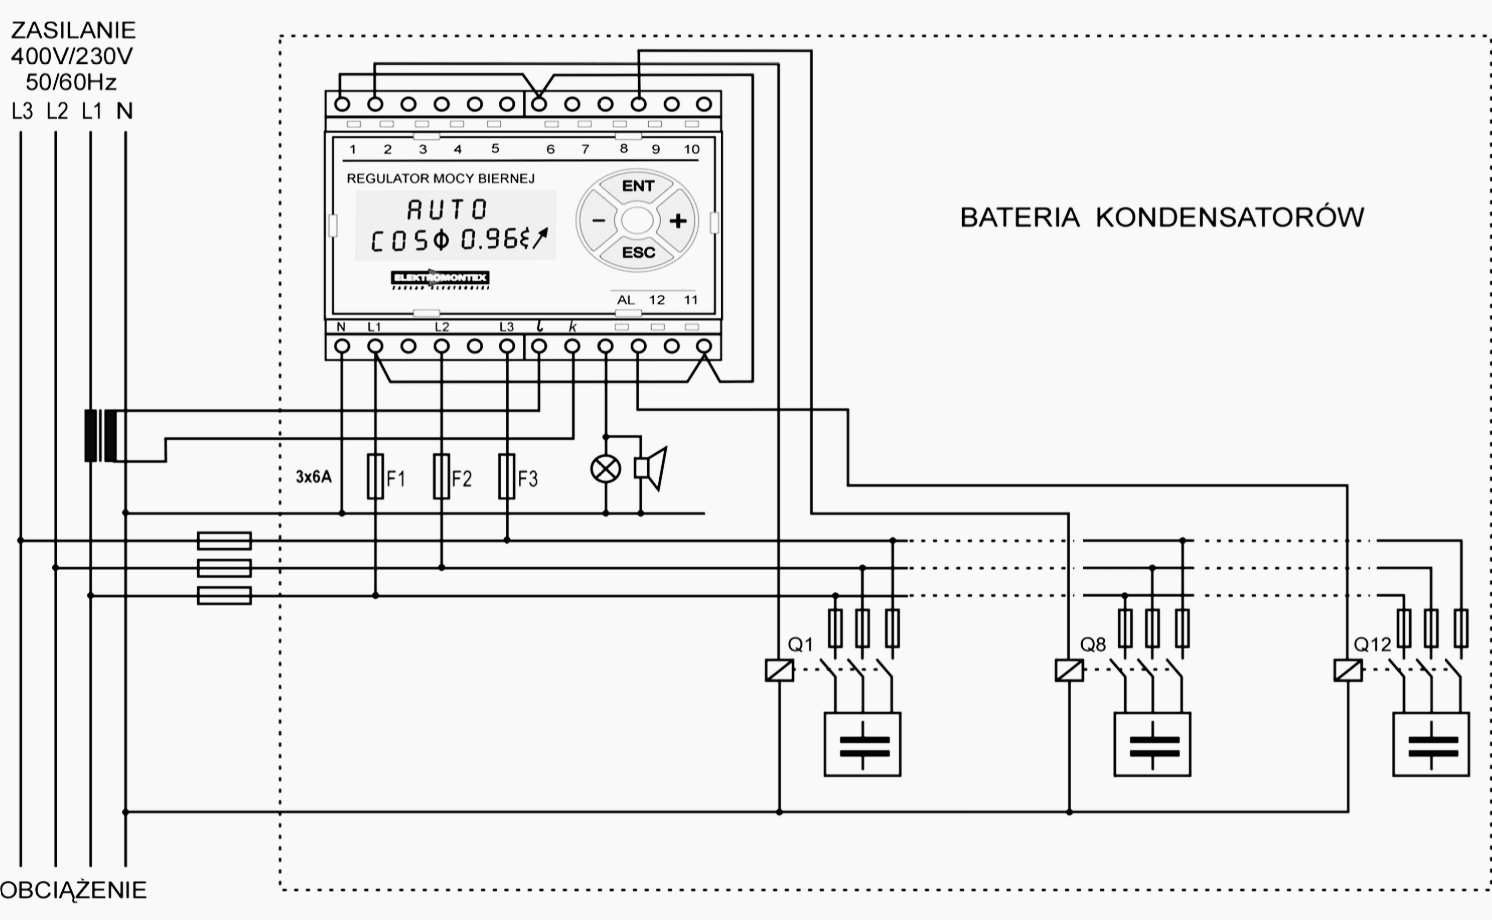 [FPER_4992]  Capacitor Bank Control Wiring Diagram | Wiring Diagram Panel Kapasitor |  | Wiring Diagram